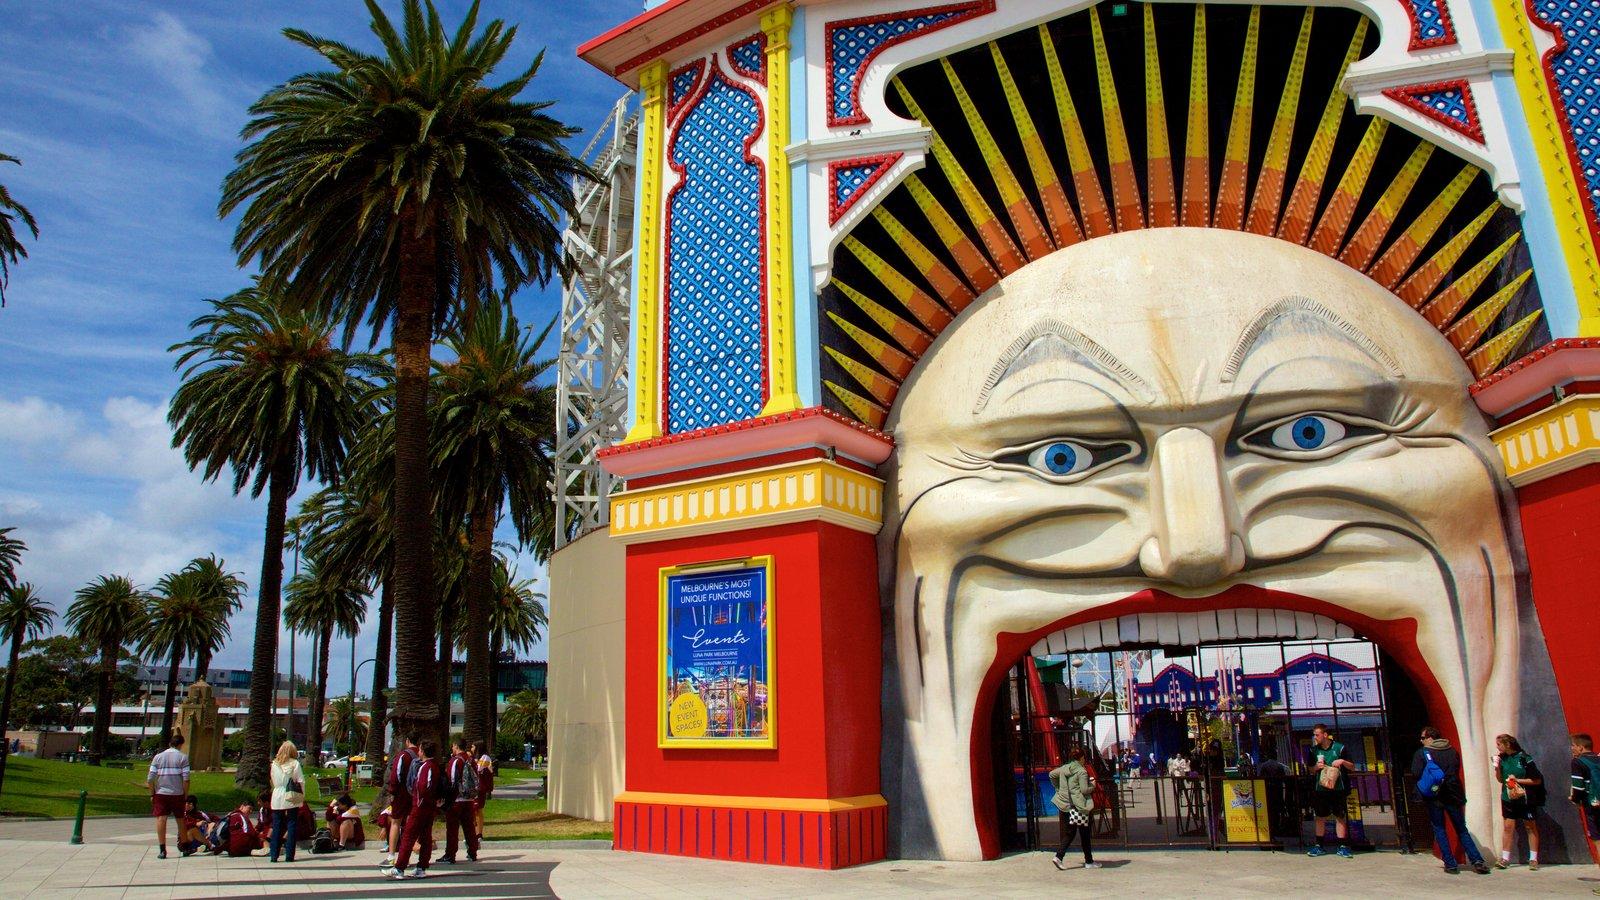 Luna Park featuring rides